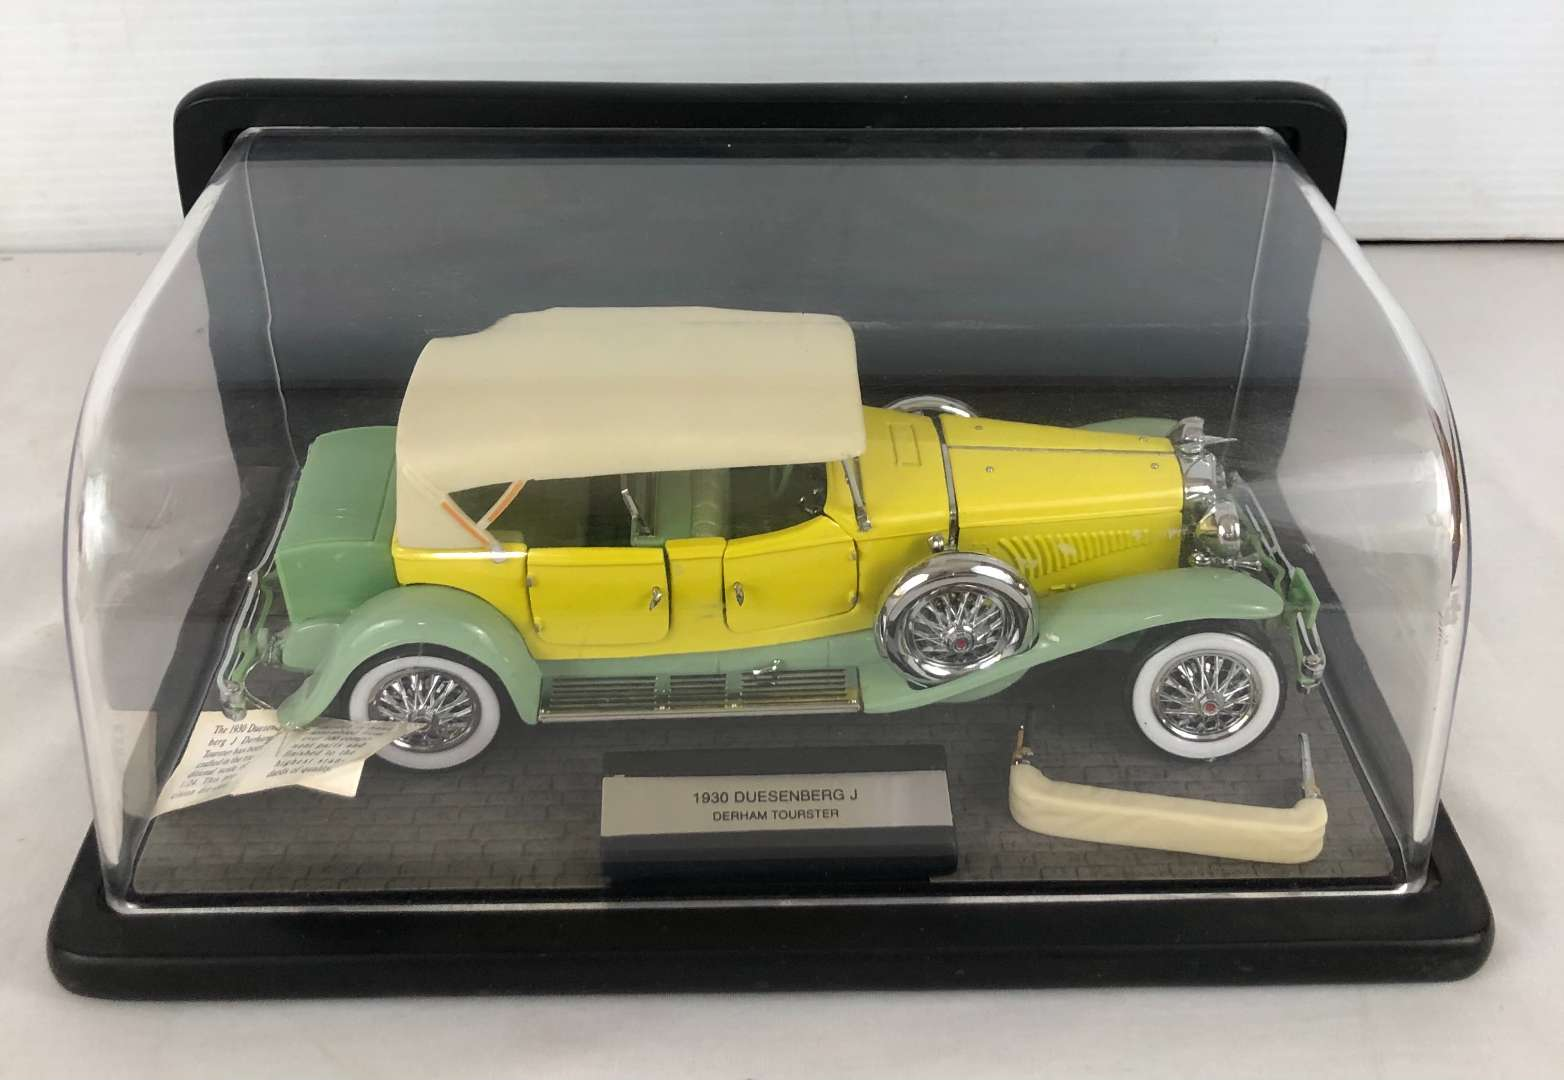 Lot # 152 - 1930 Duesenberg J Derham Tourster 1:24 Scale Model (main image)